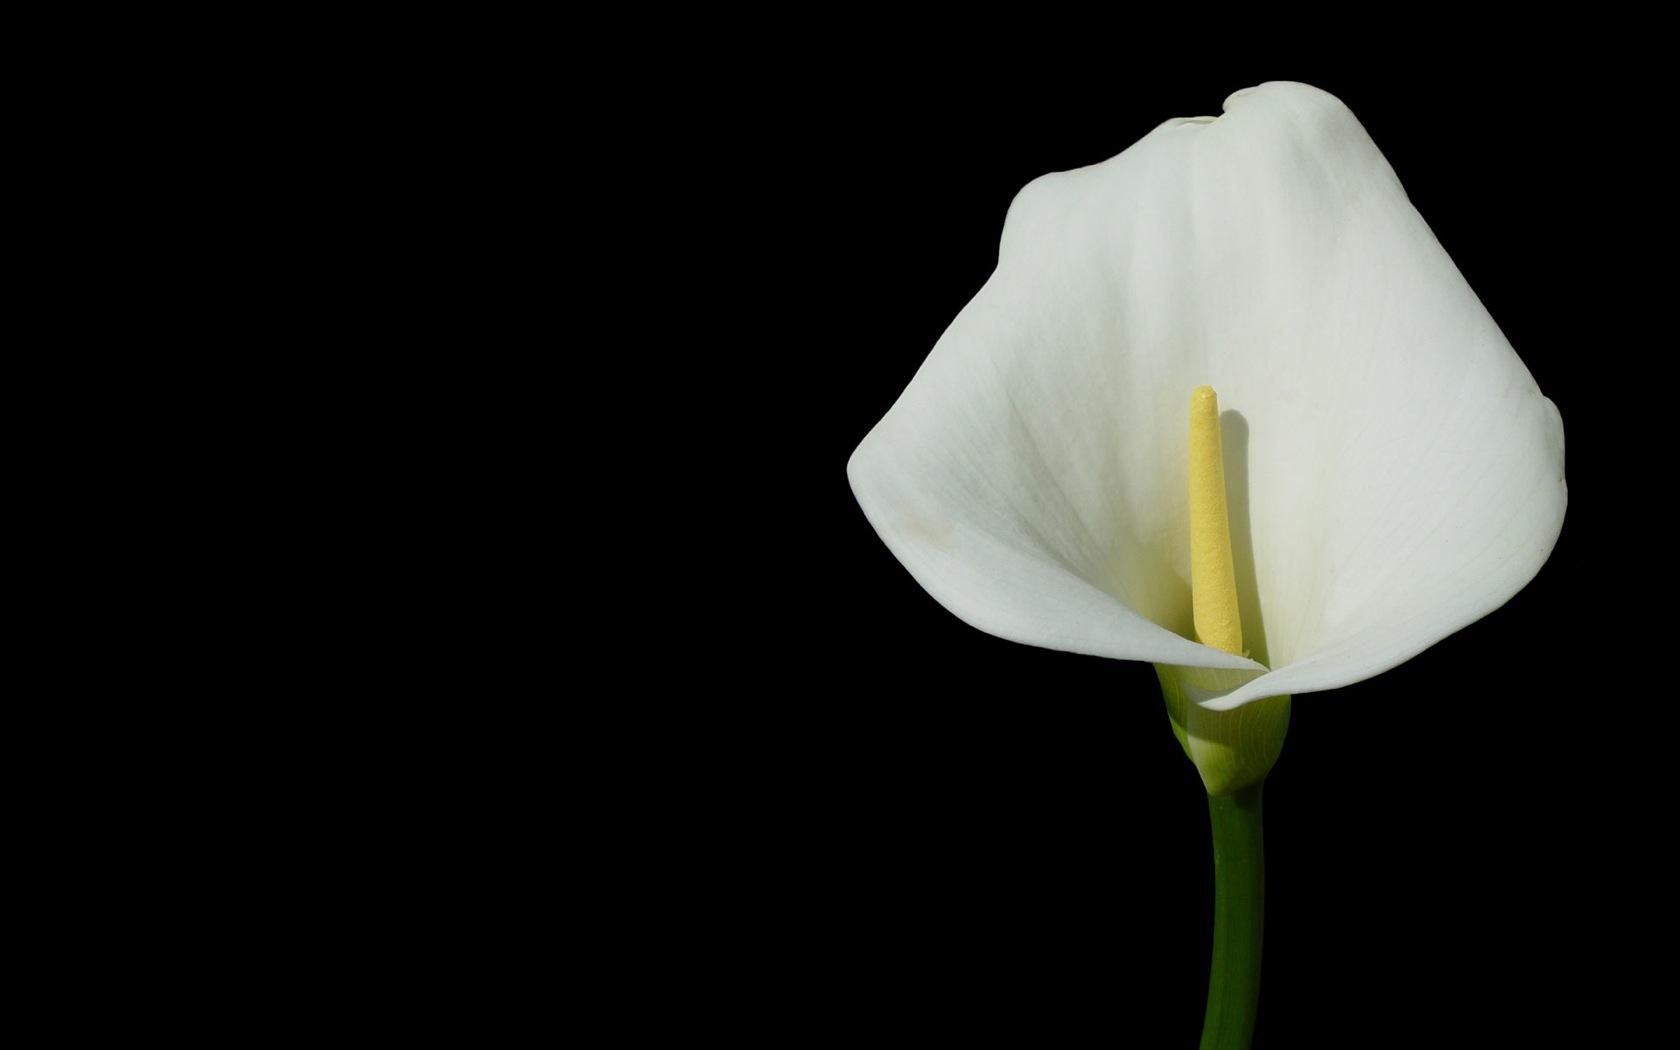 Free Download Black And White Flower Wallpaper Hd Desktop